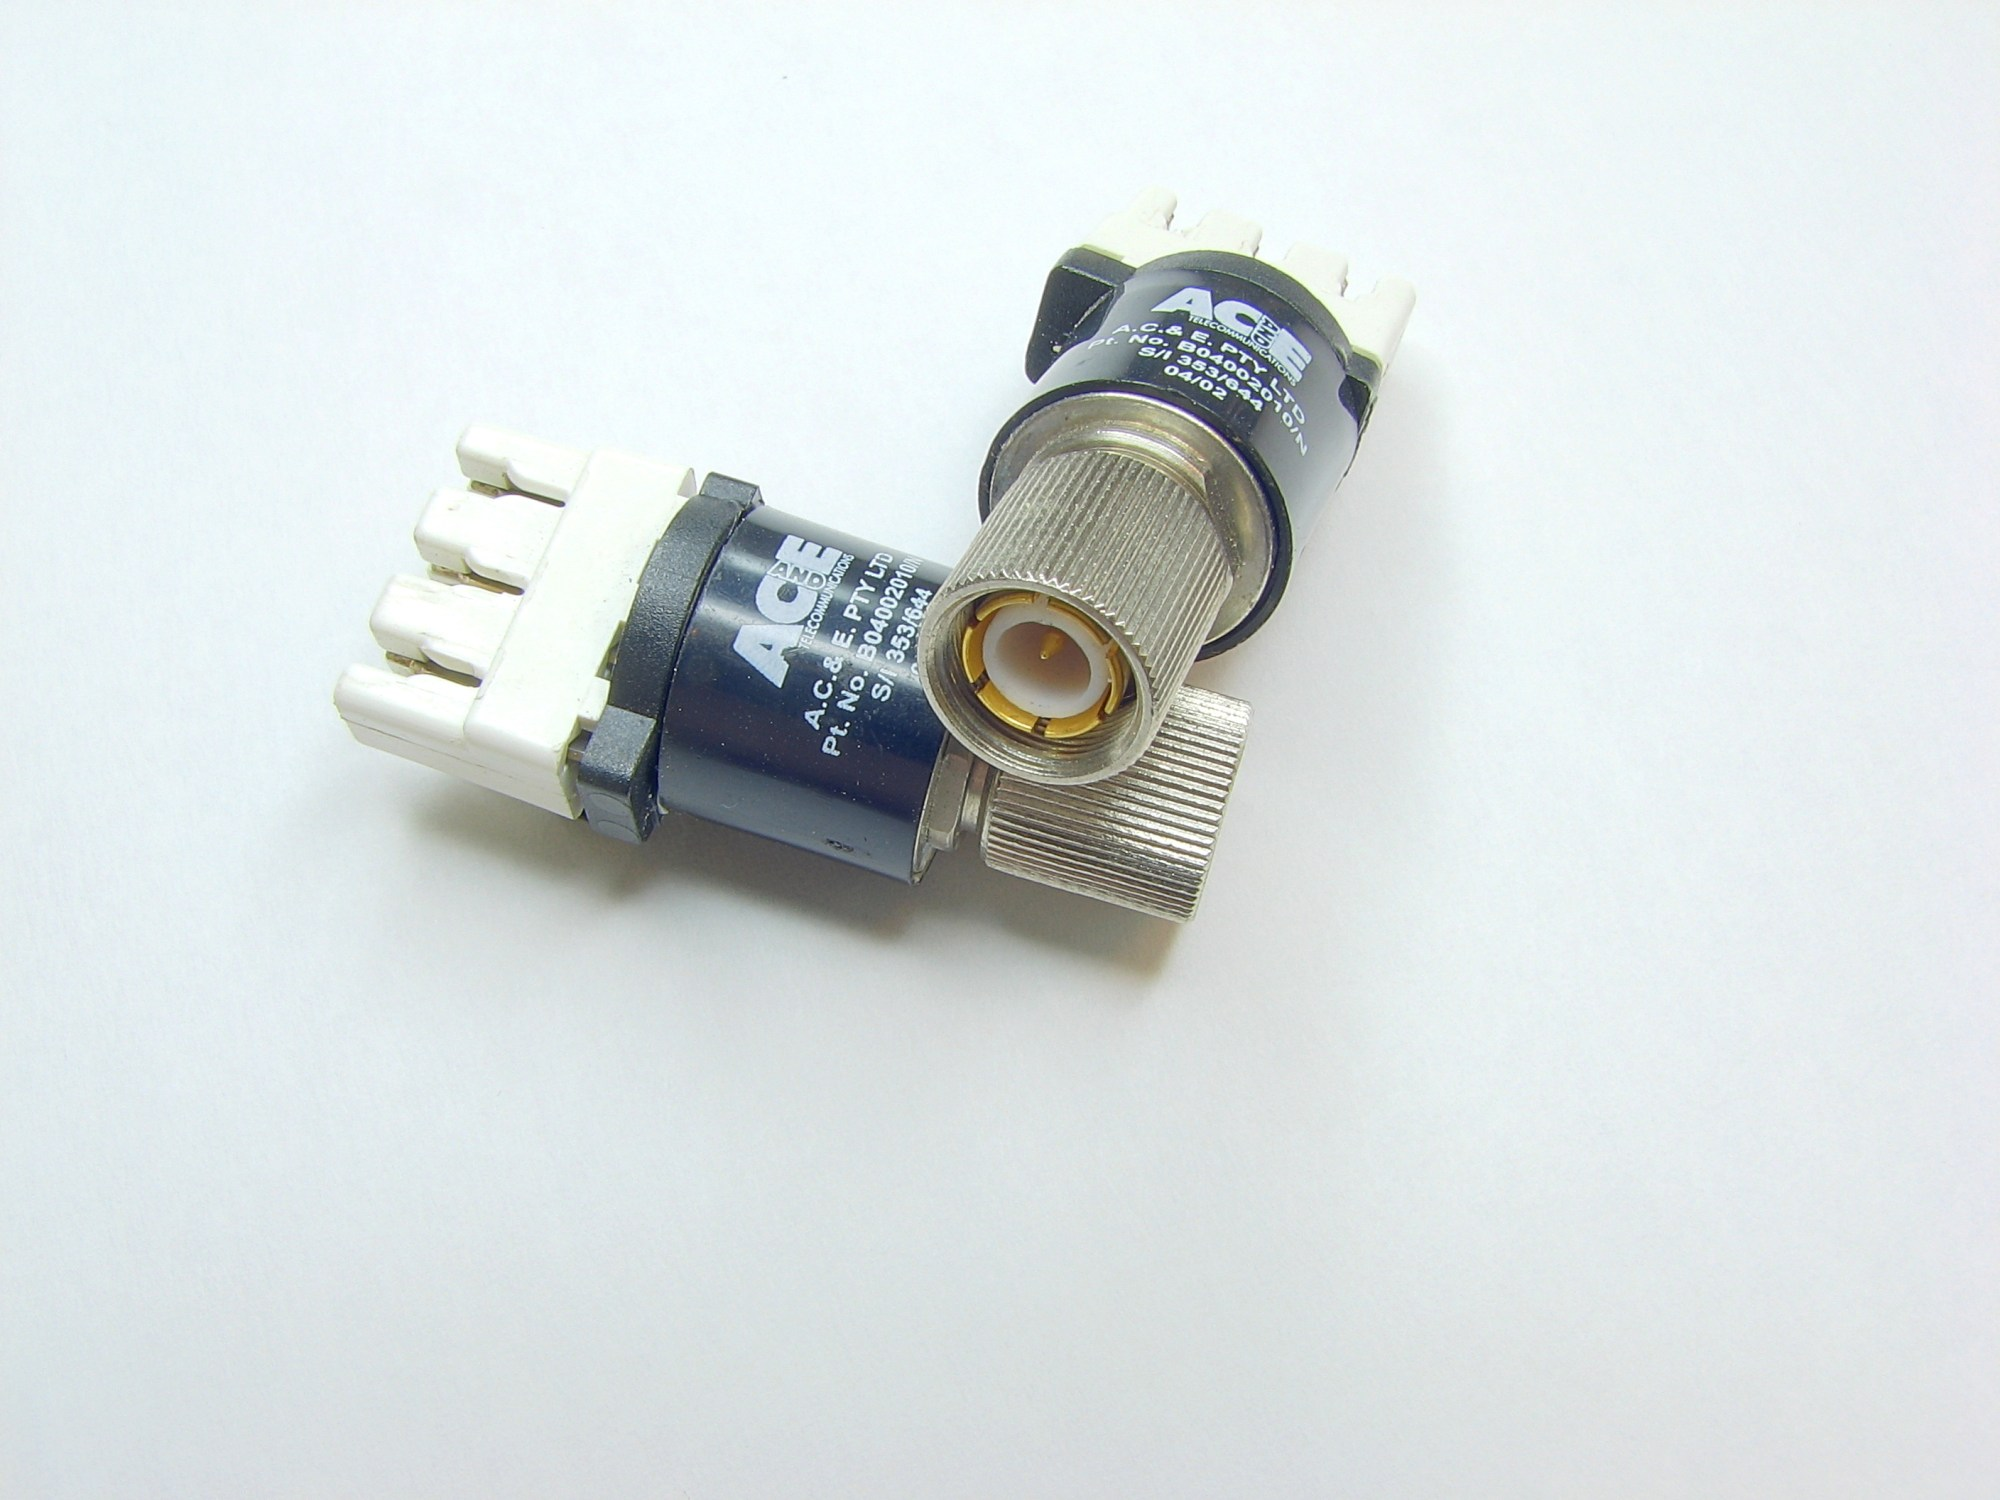 hight resolution of cctv balun cat5 wiring diagram